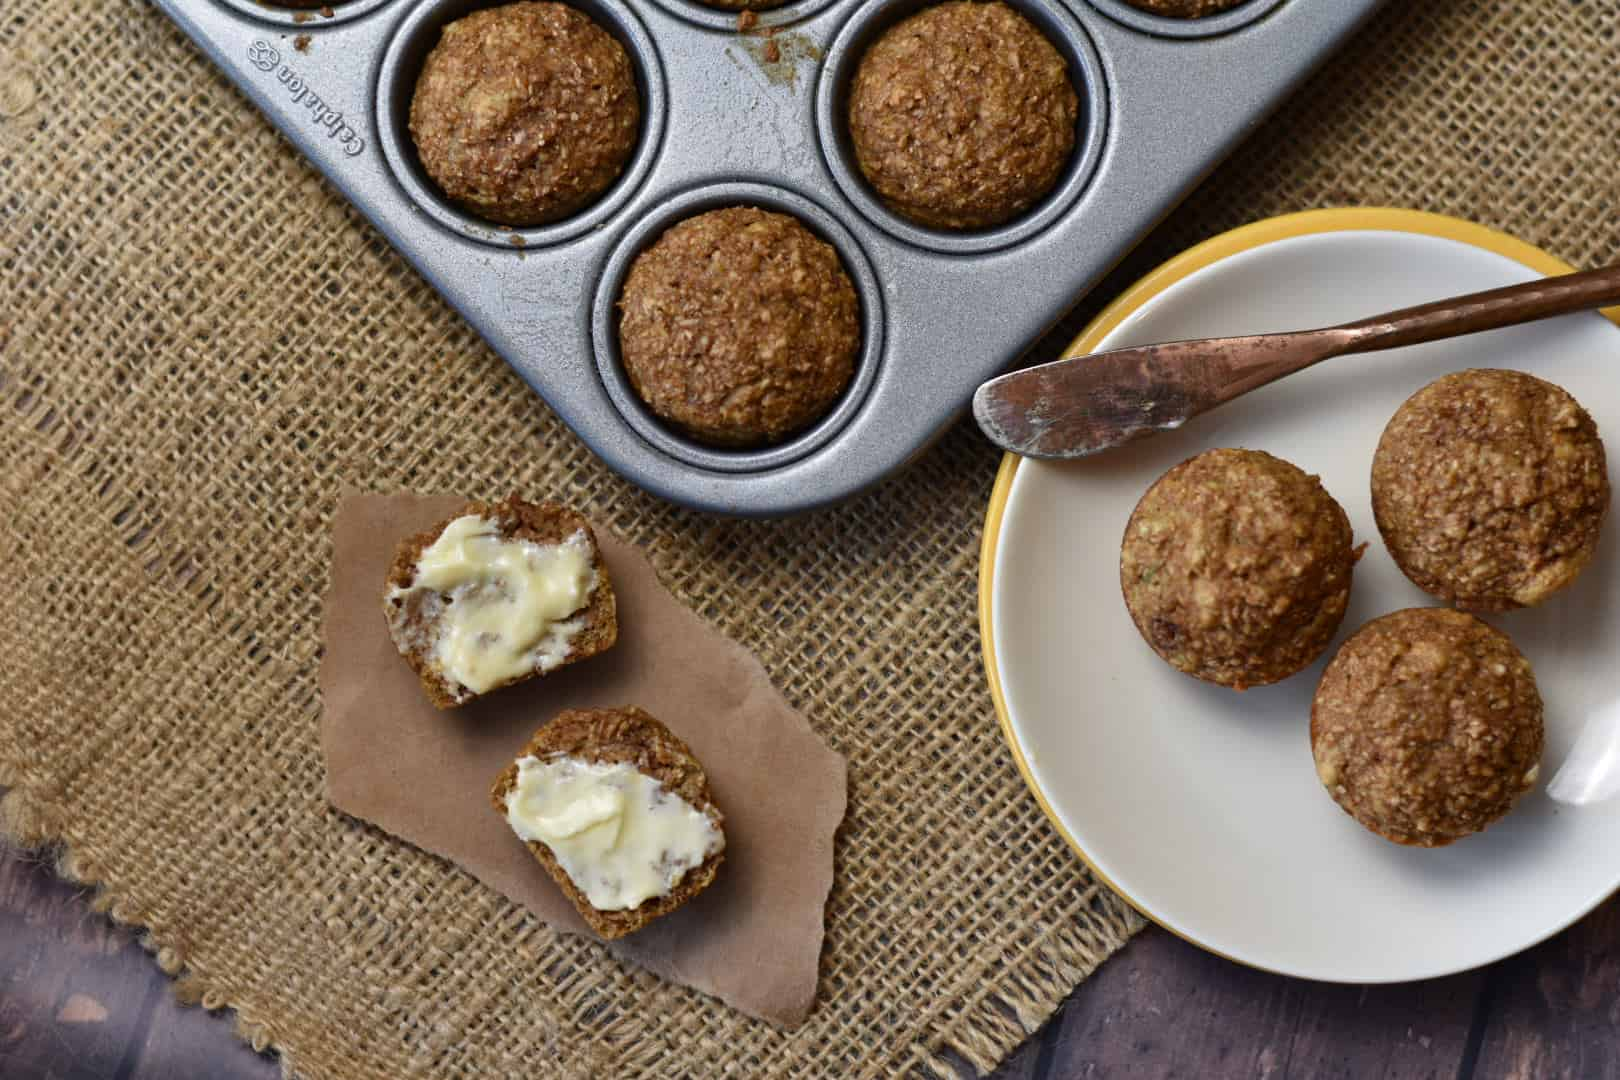 miniature bran muffins sitting on a plate